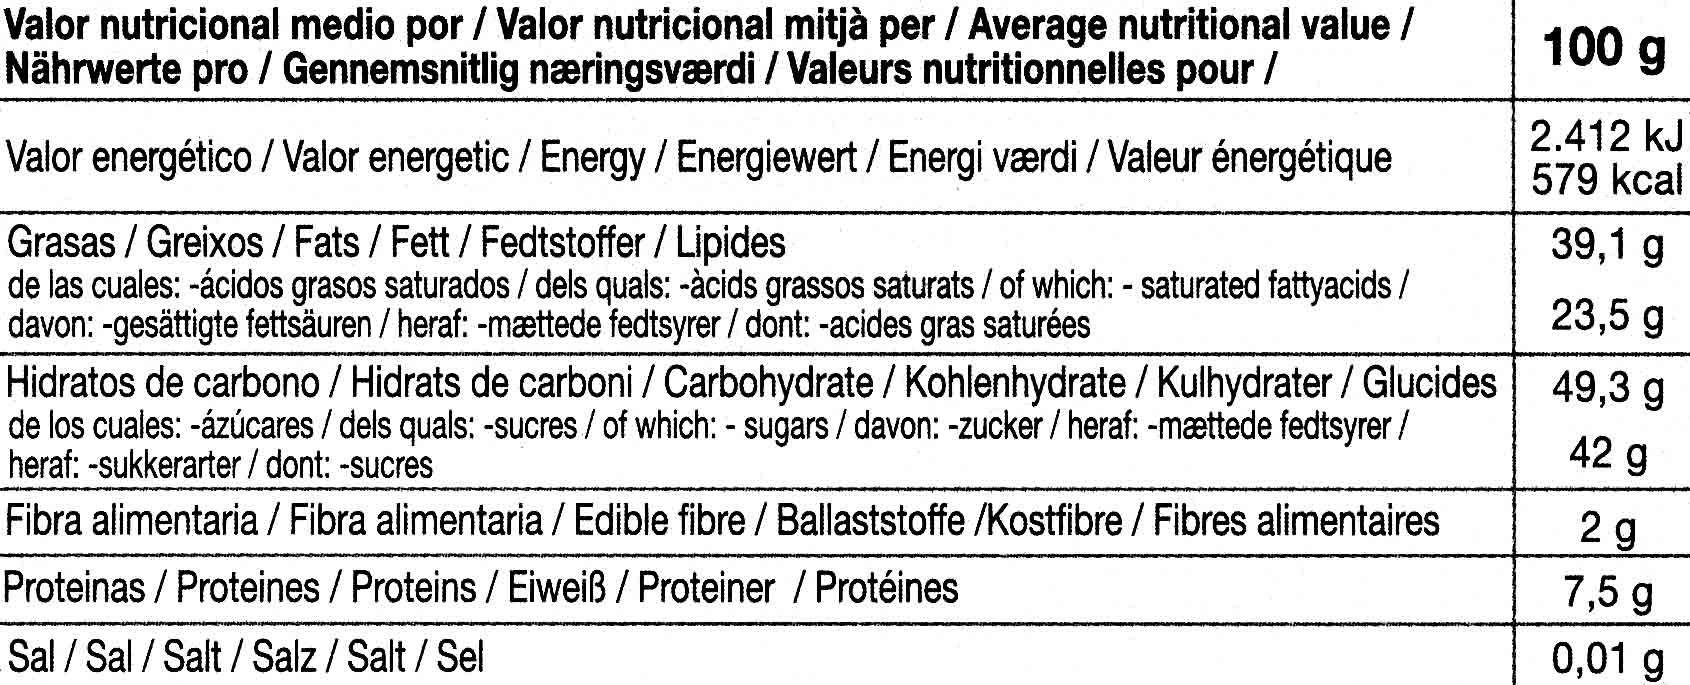 Chocolate negro con canela 56% cacao - Informació nutricional